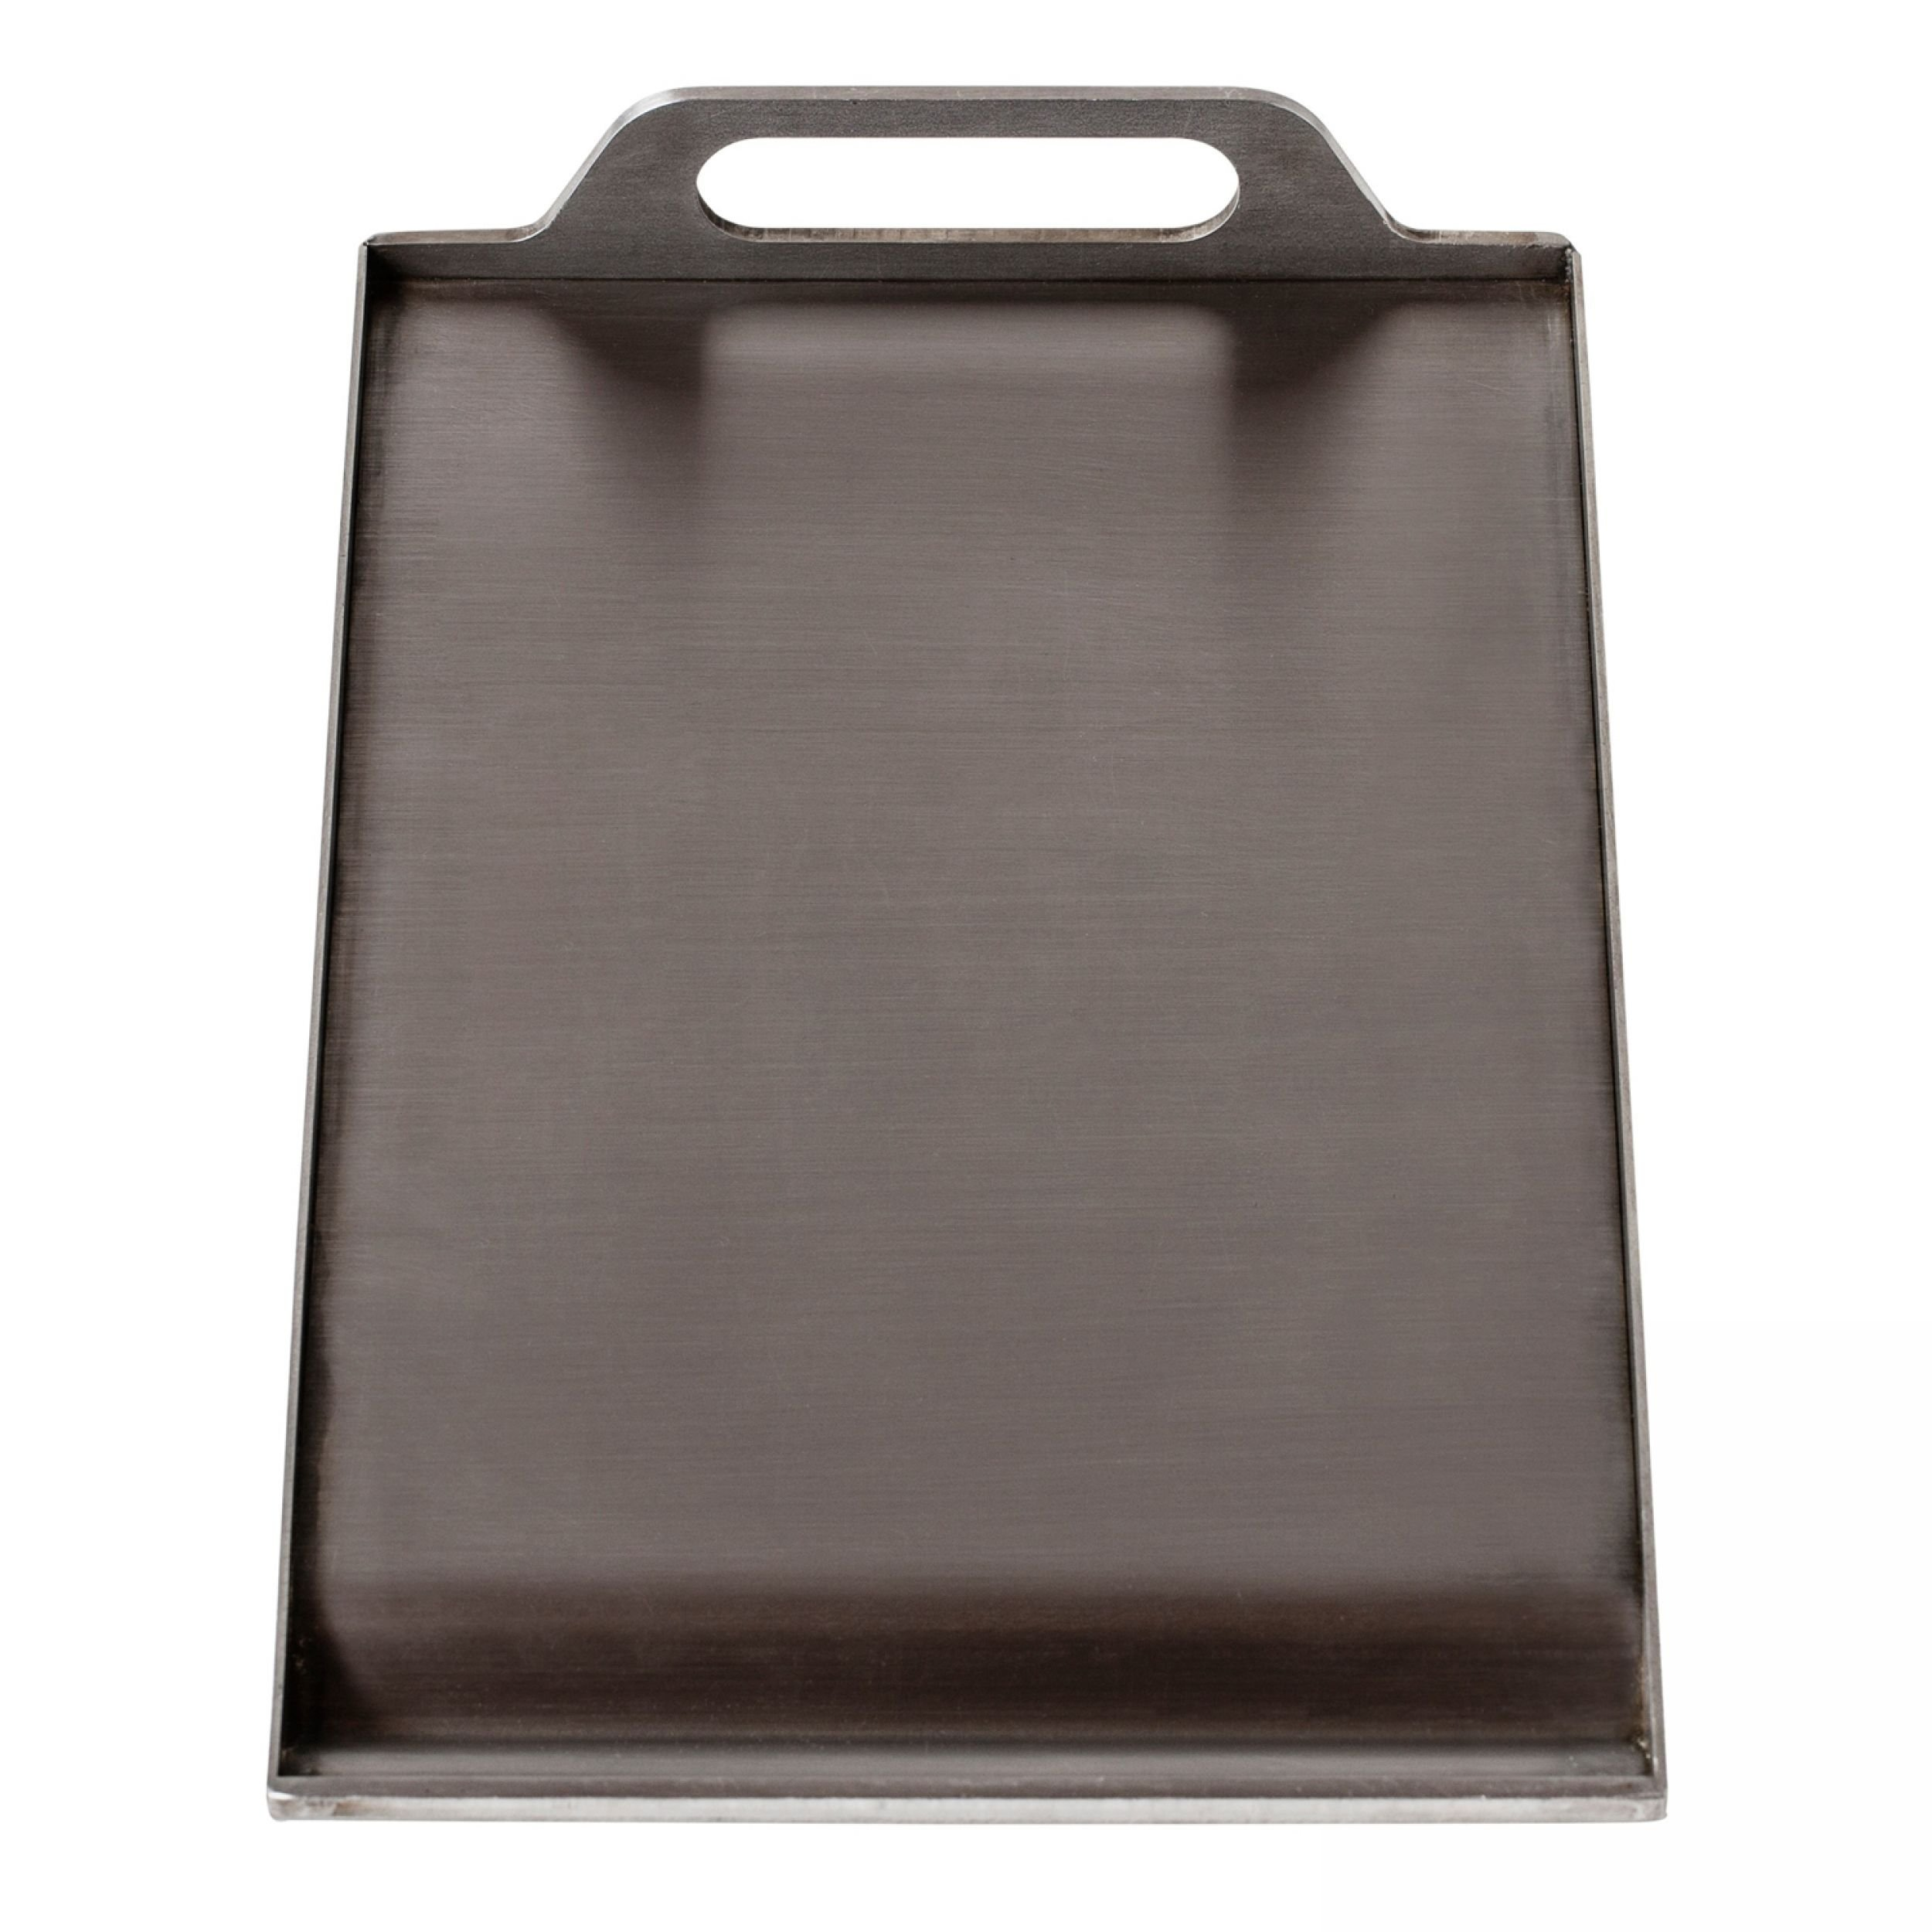 Everdure Furnace Gas Grill Teppanyaki Plate (HBG3TEPP)